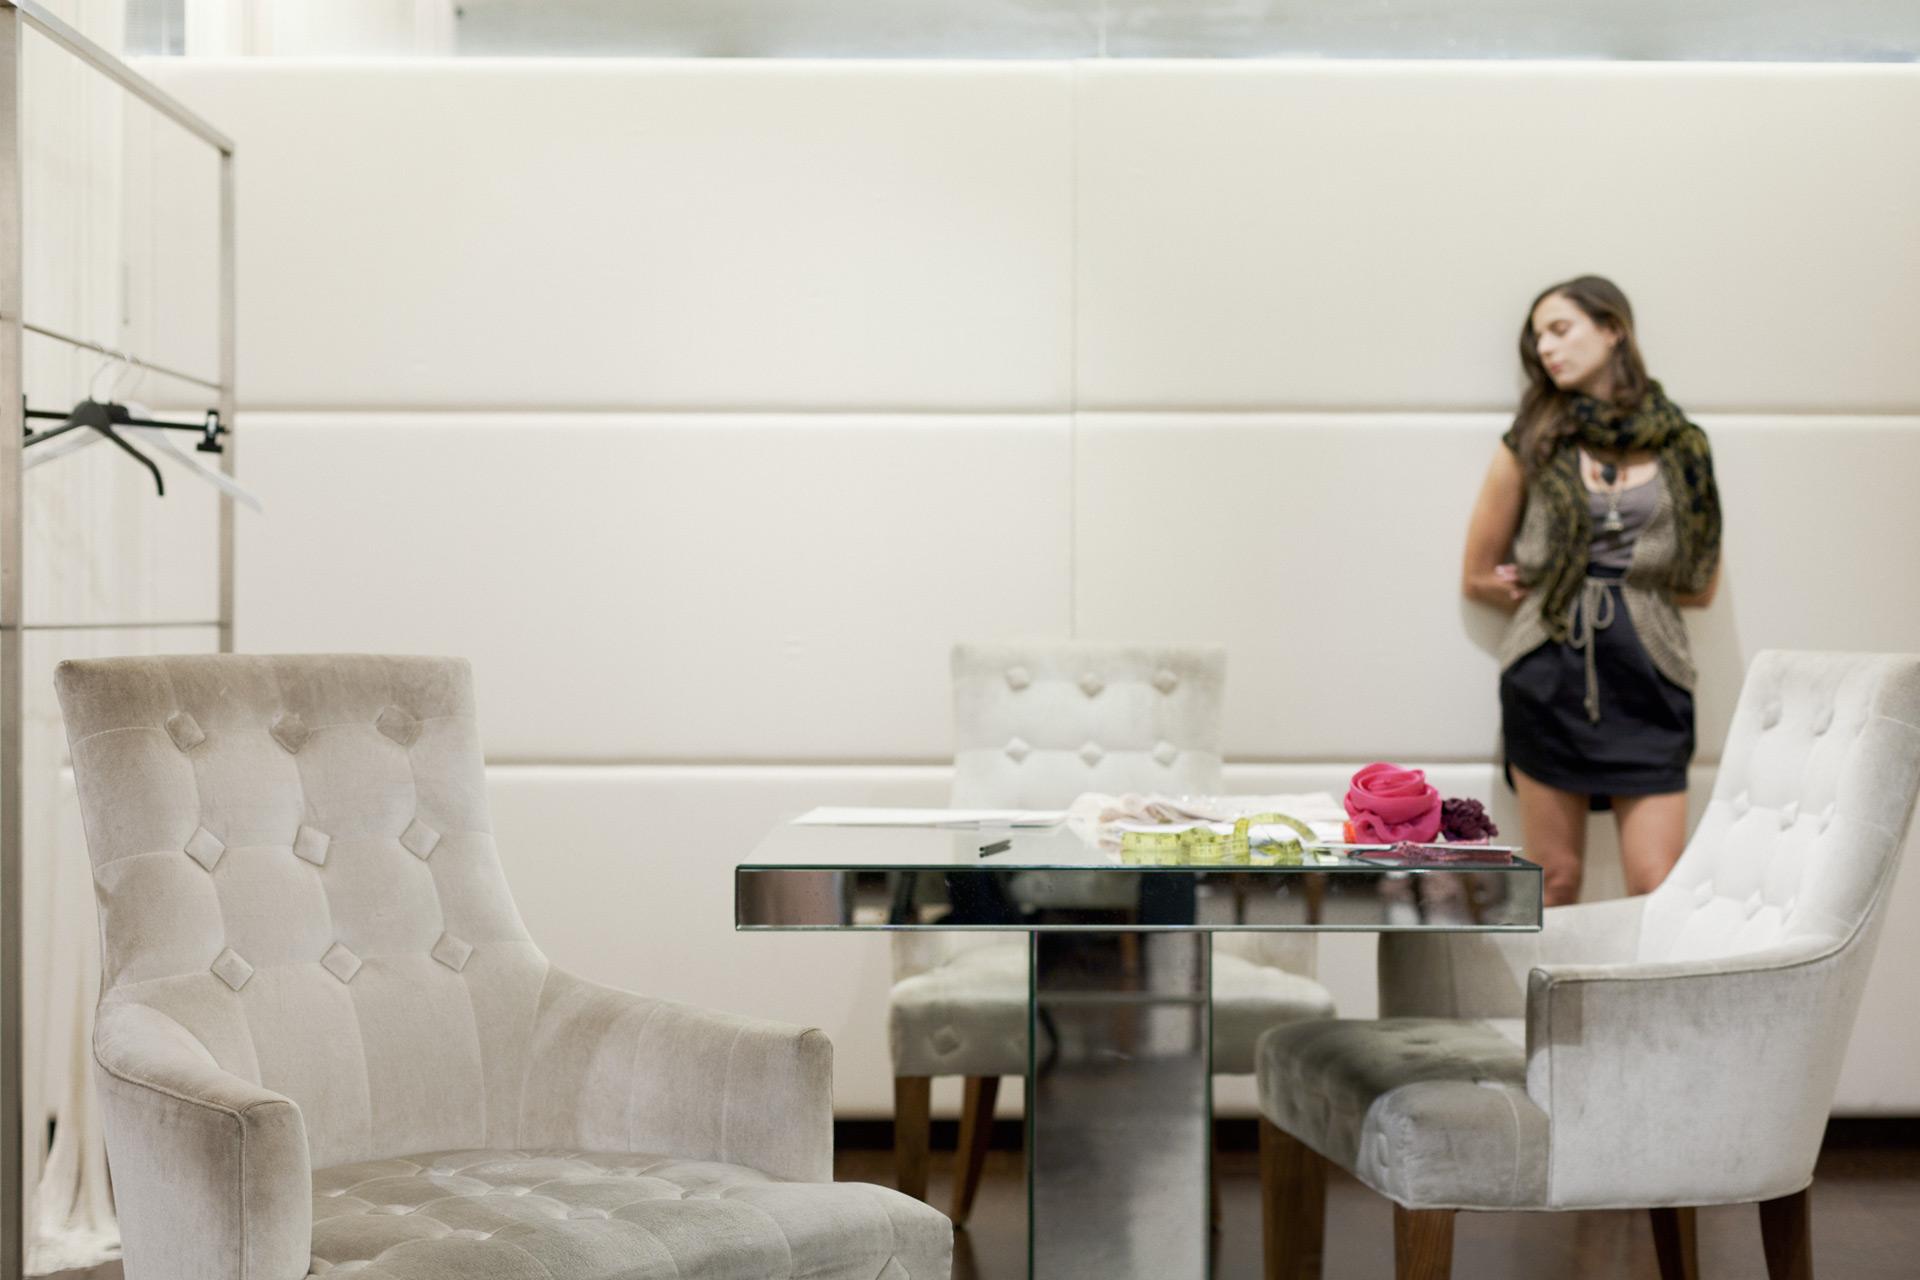 Timo_Stammberger_Woman_Fashion_New_York_Interior_Artist